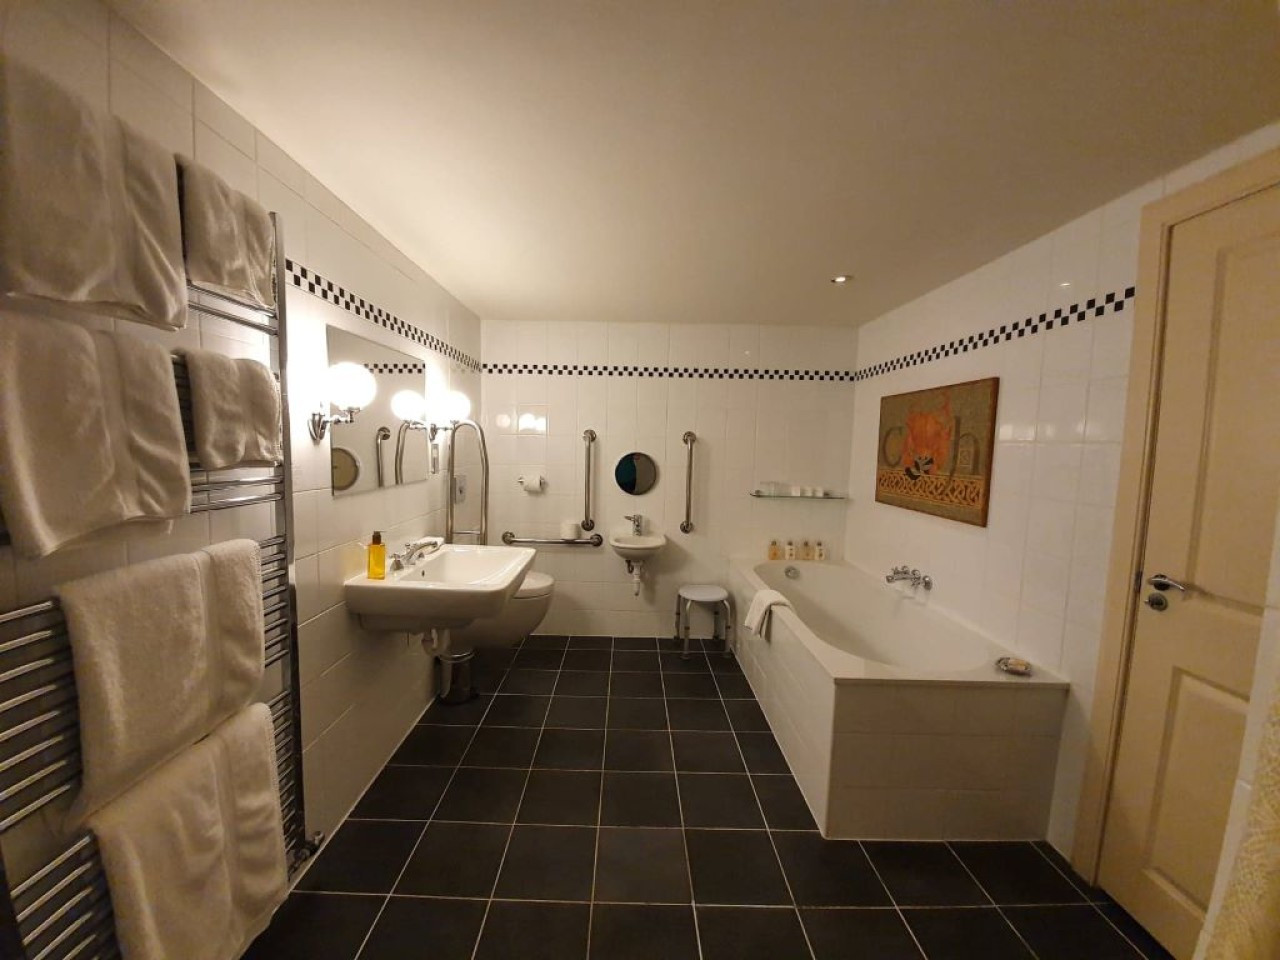 Sumardalr Bathroom